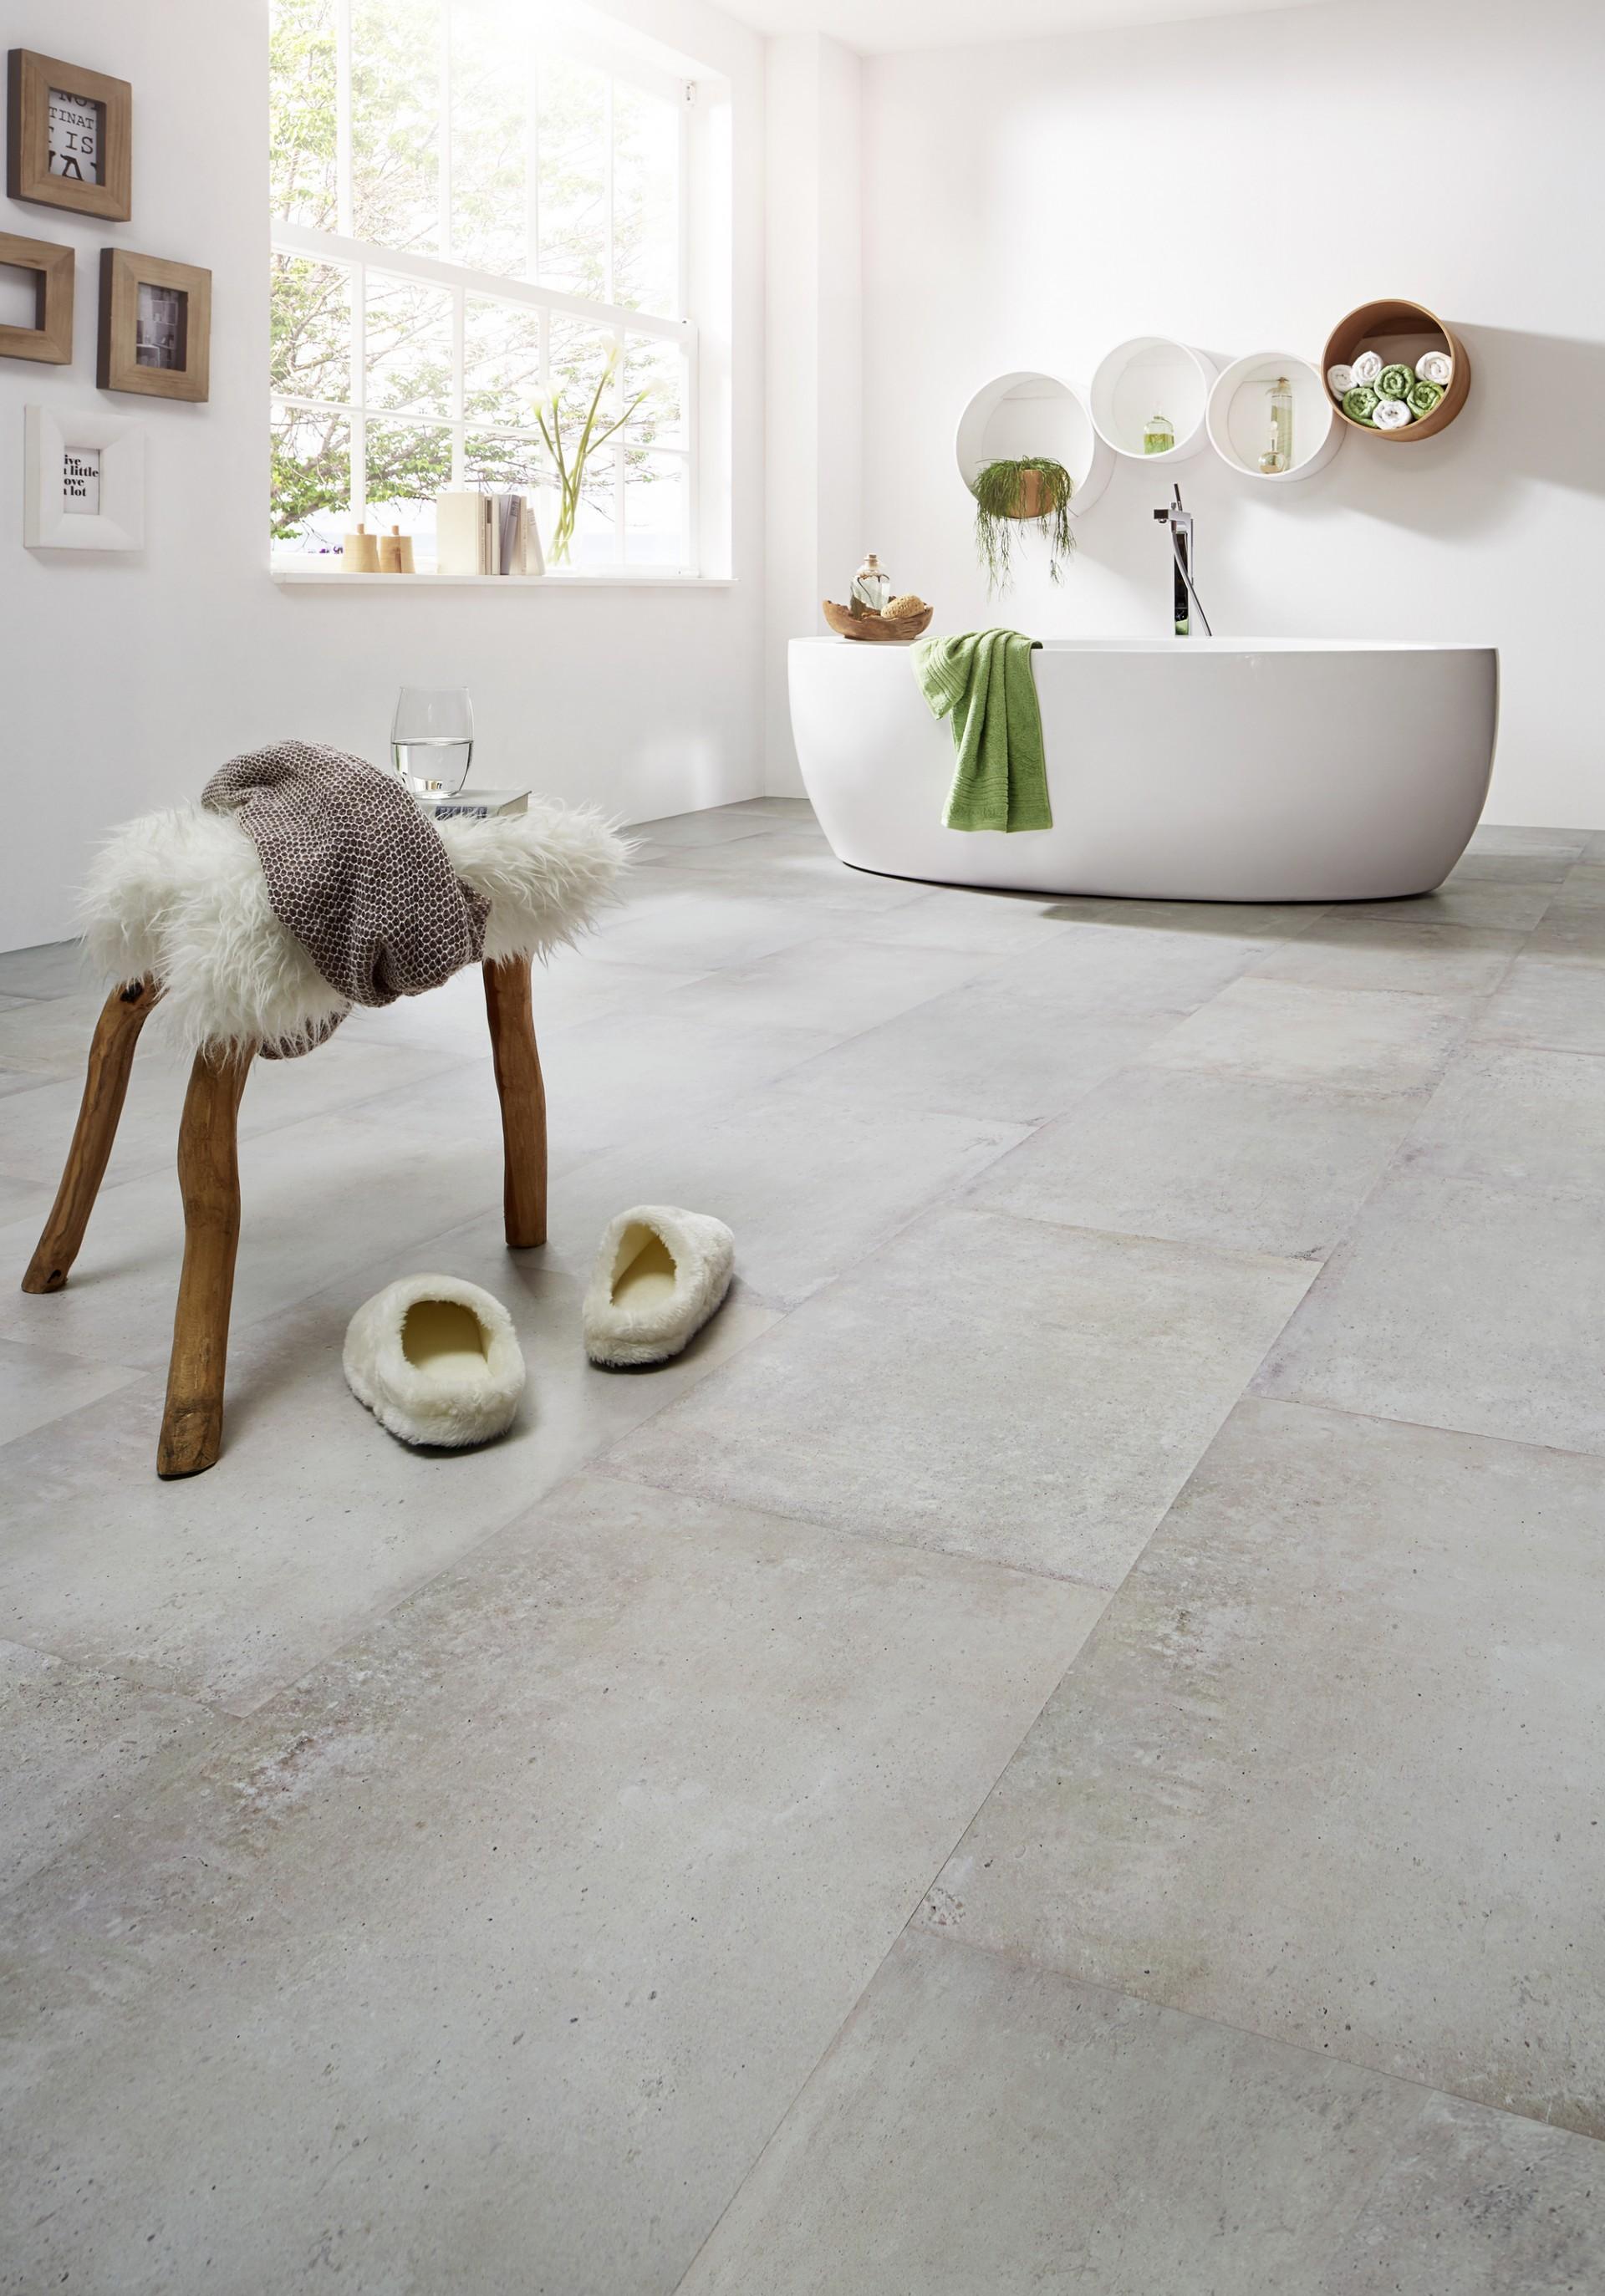 liege-salle-de-bain-3